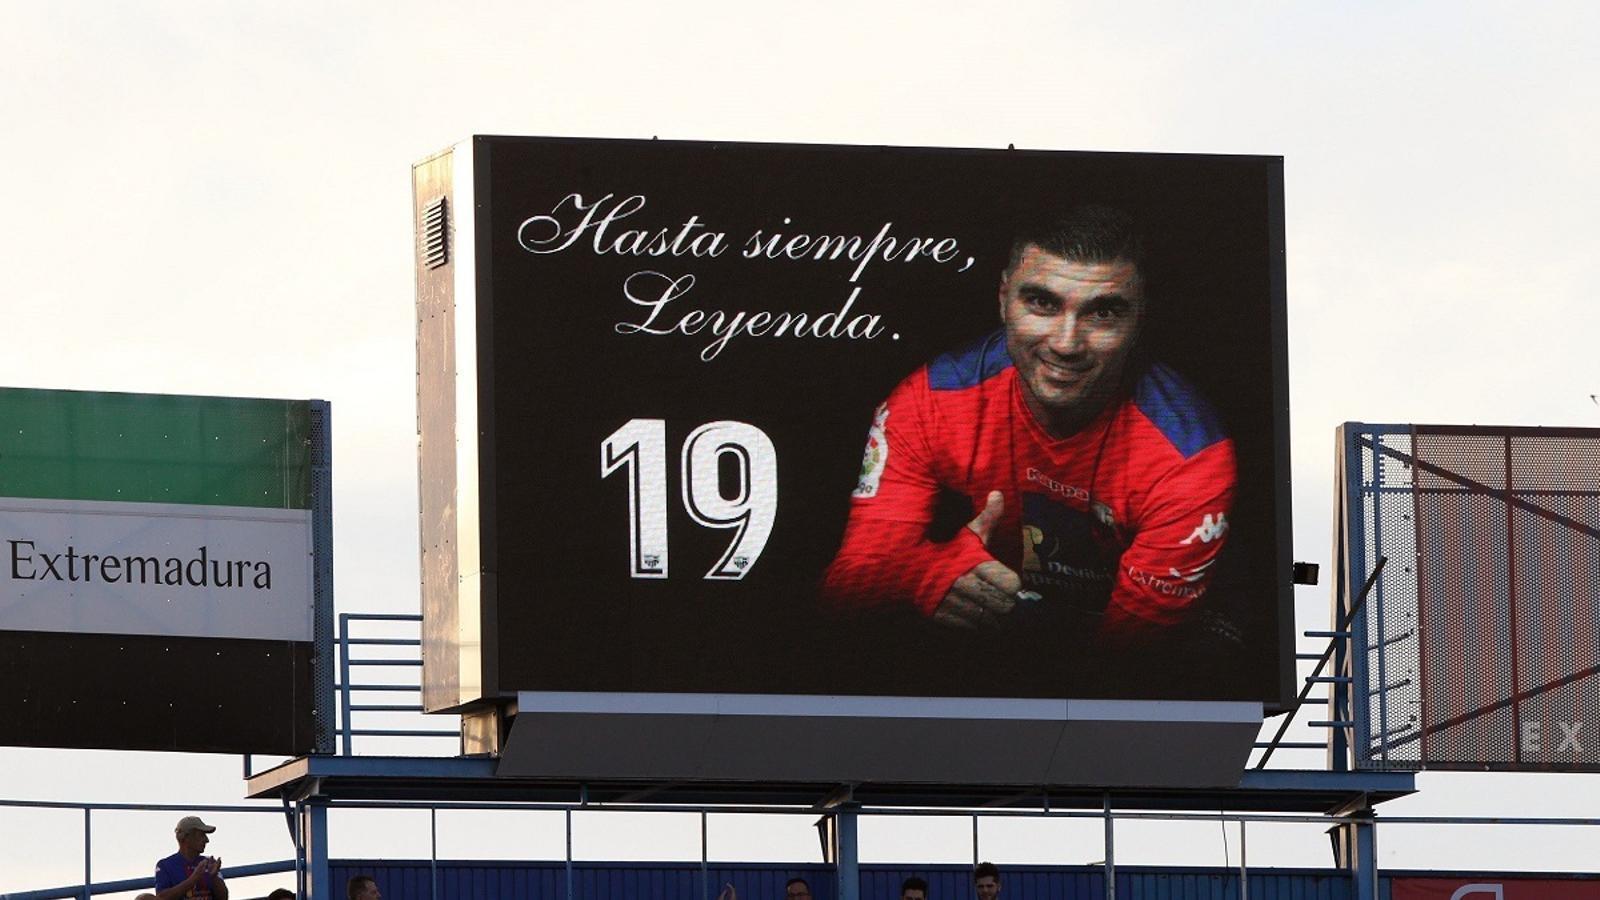 L'Extremadura va retre homenatge al seu exjugador José Antonio Reyes